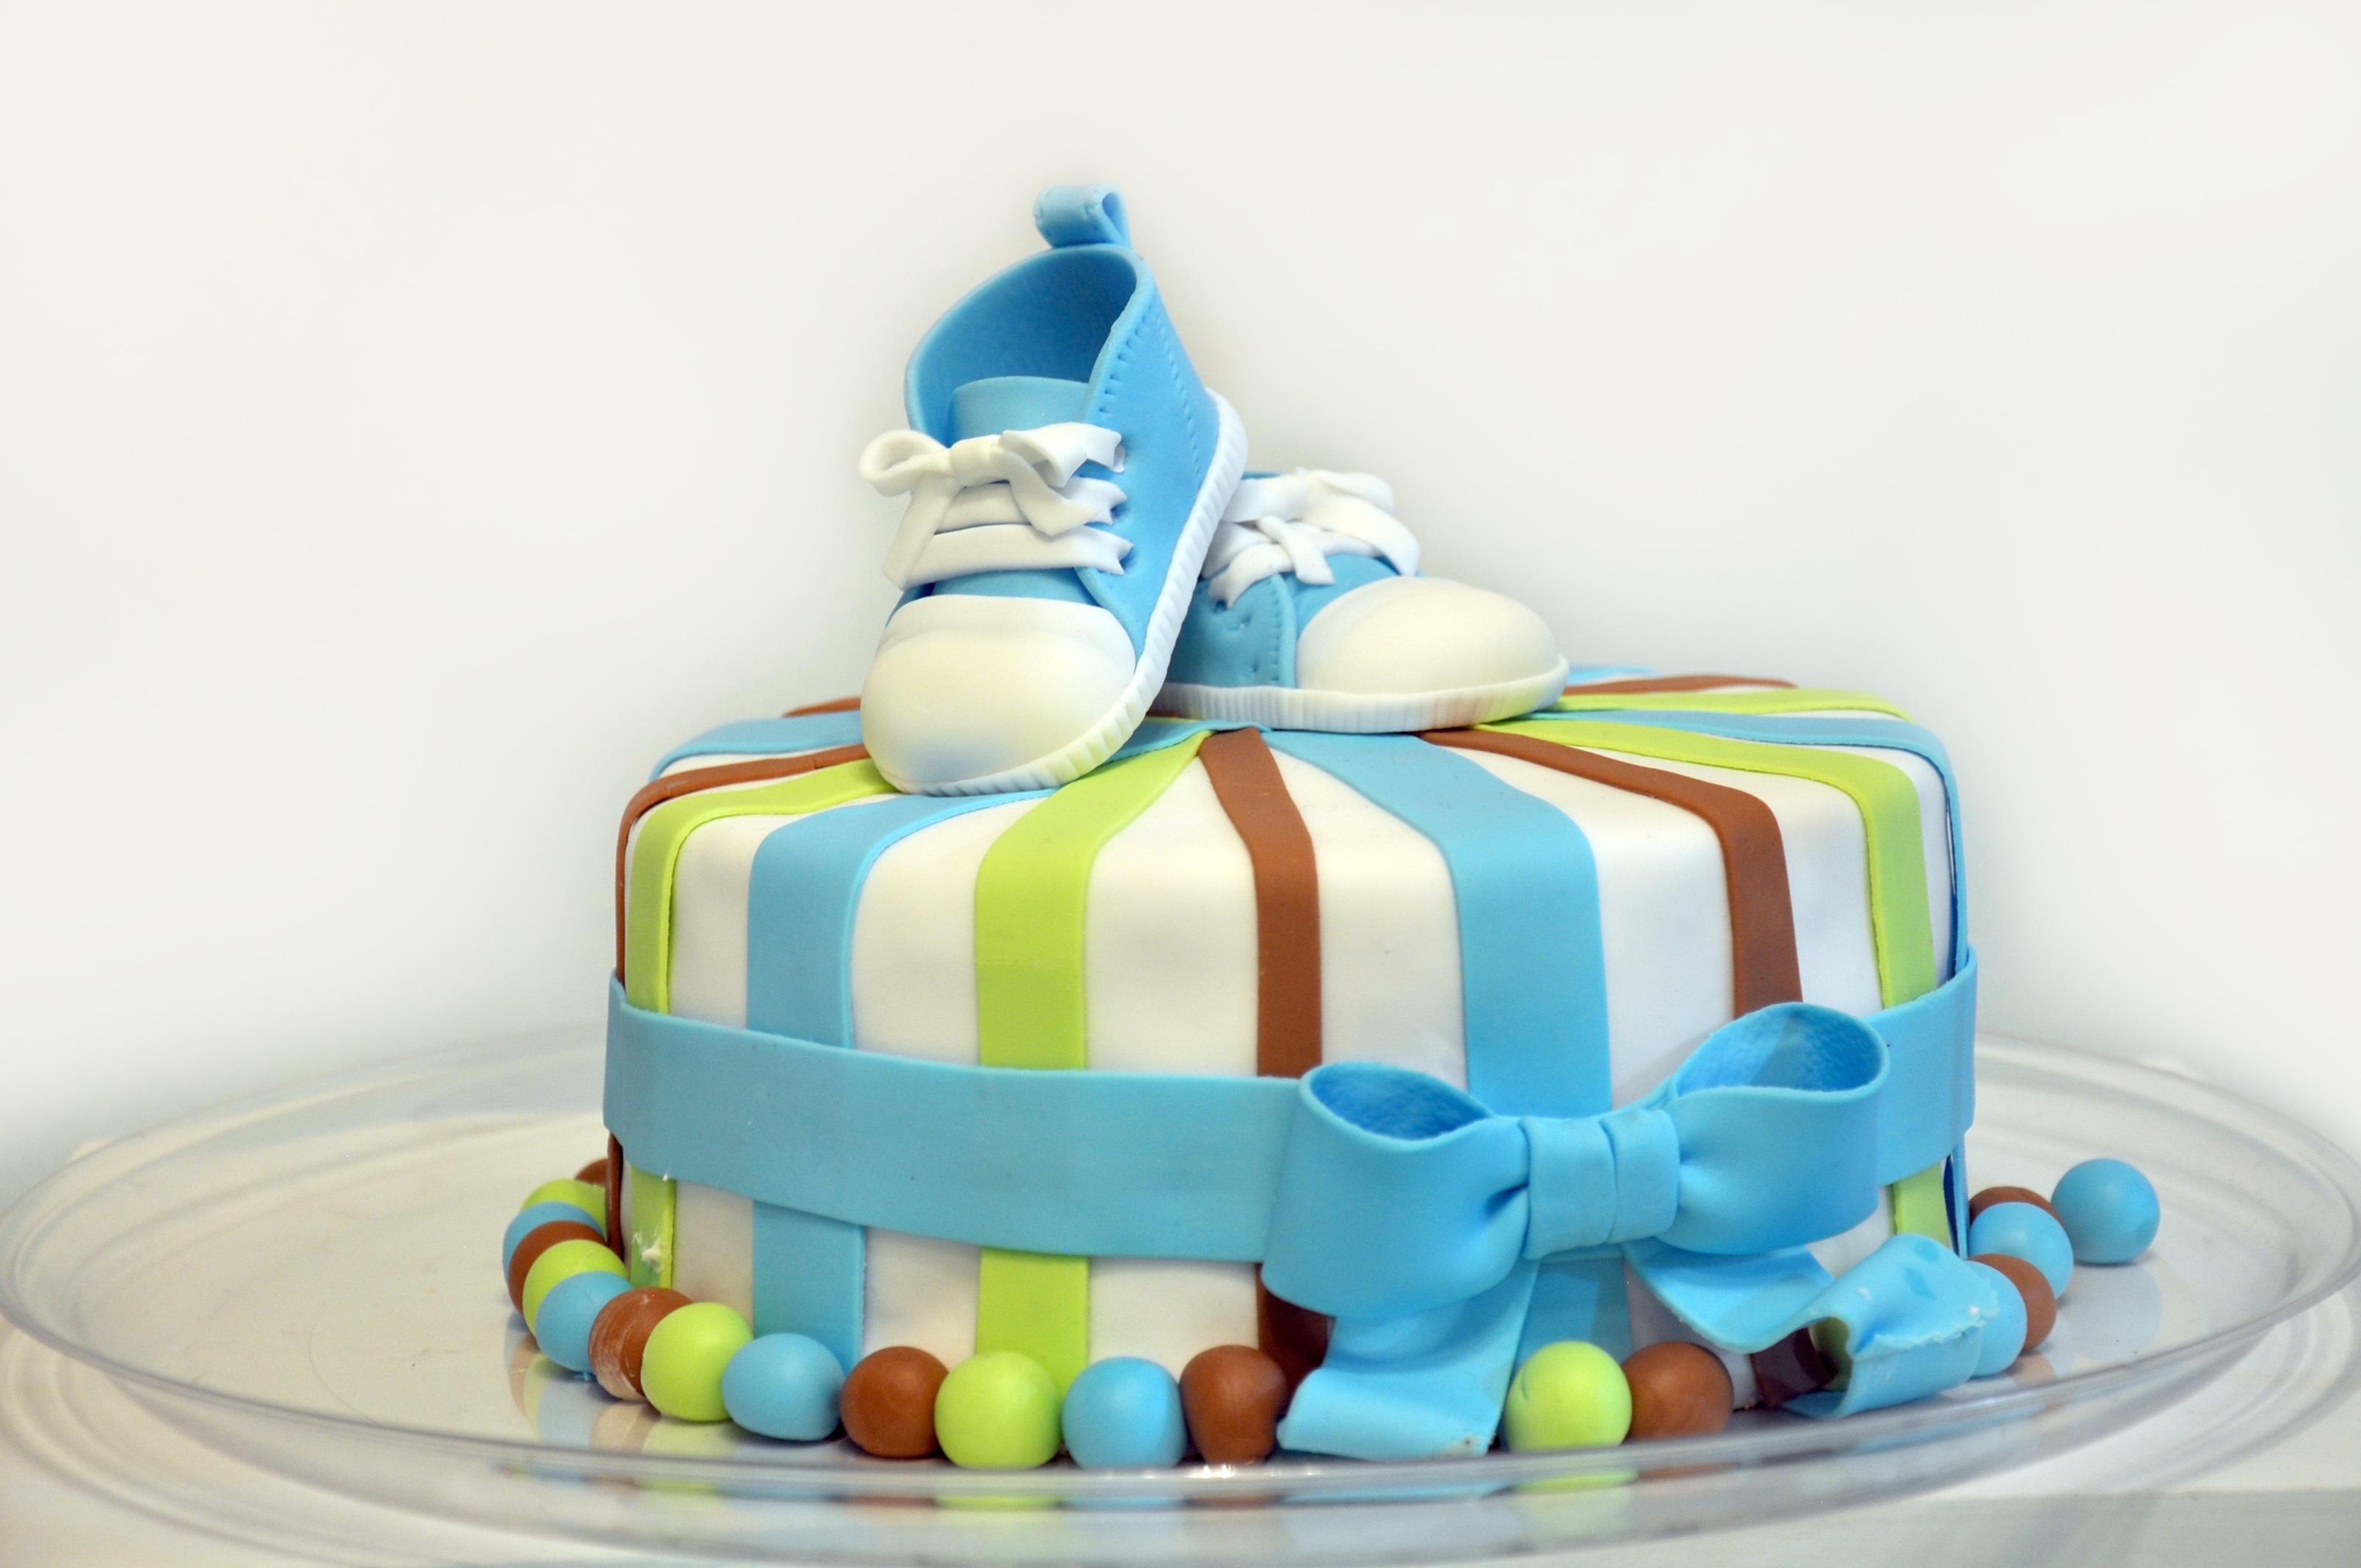 comida postre pastel pastel de cumpleaos fiesta fondant productos horneados pasta de azcar decoracin de pasteles